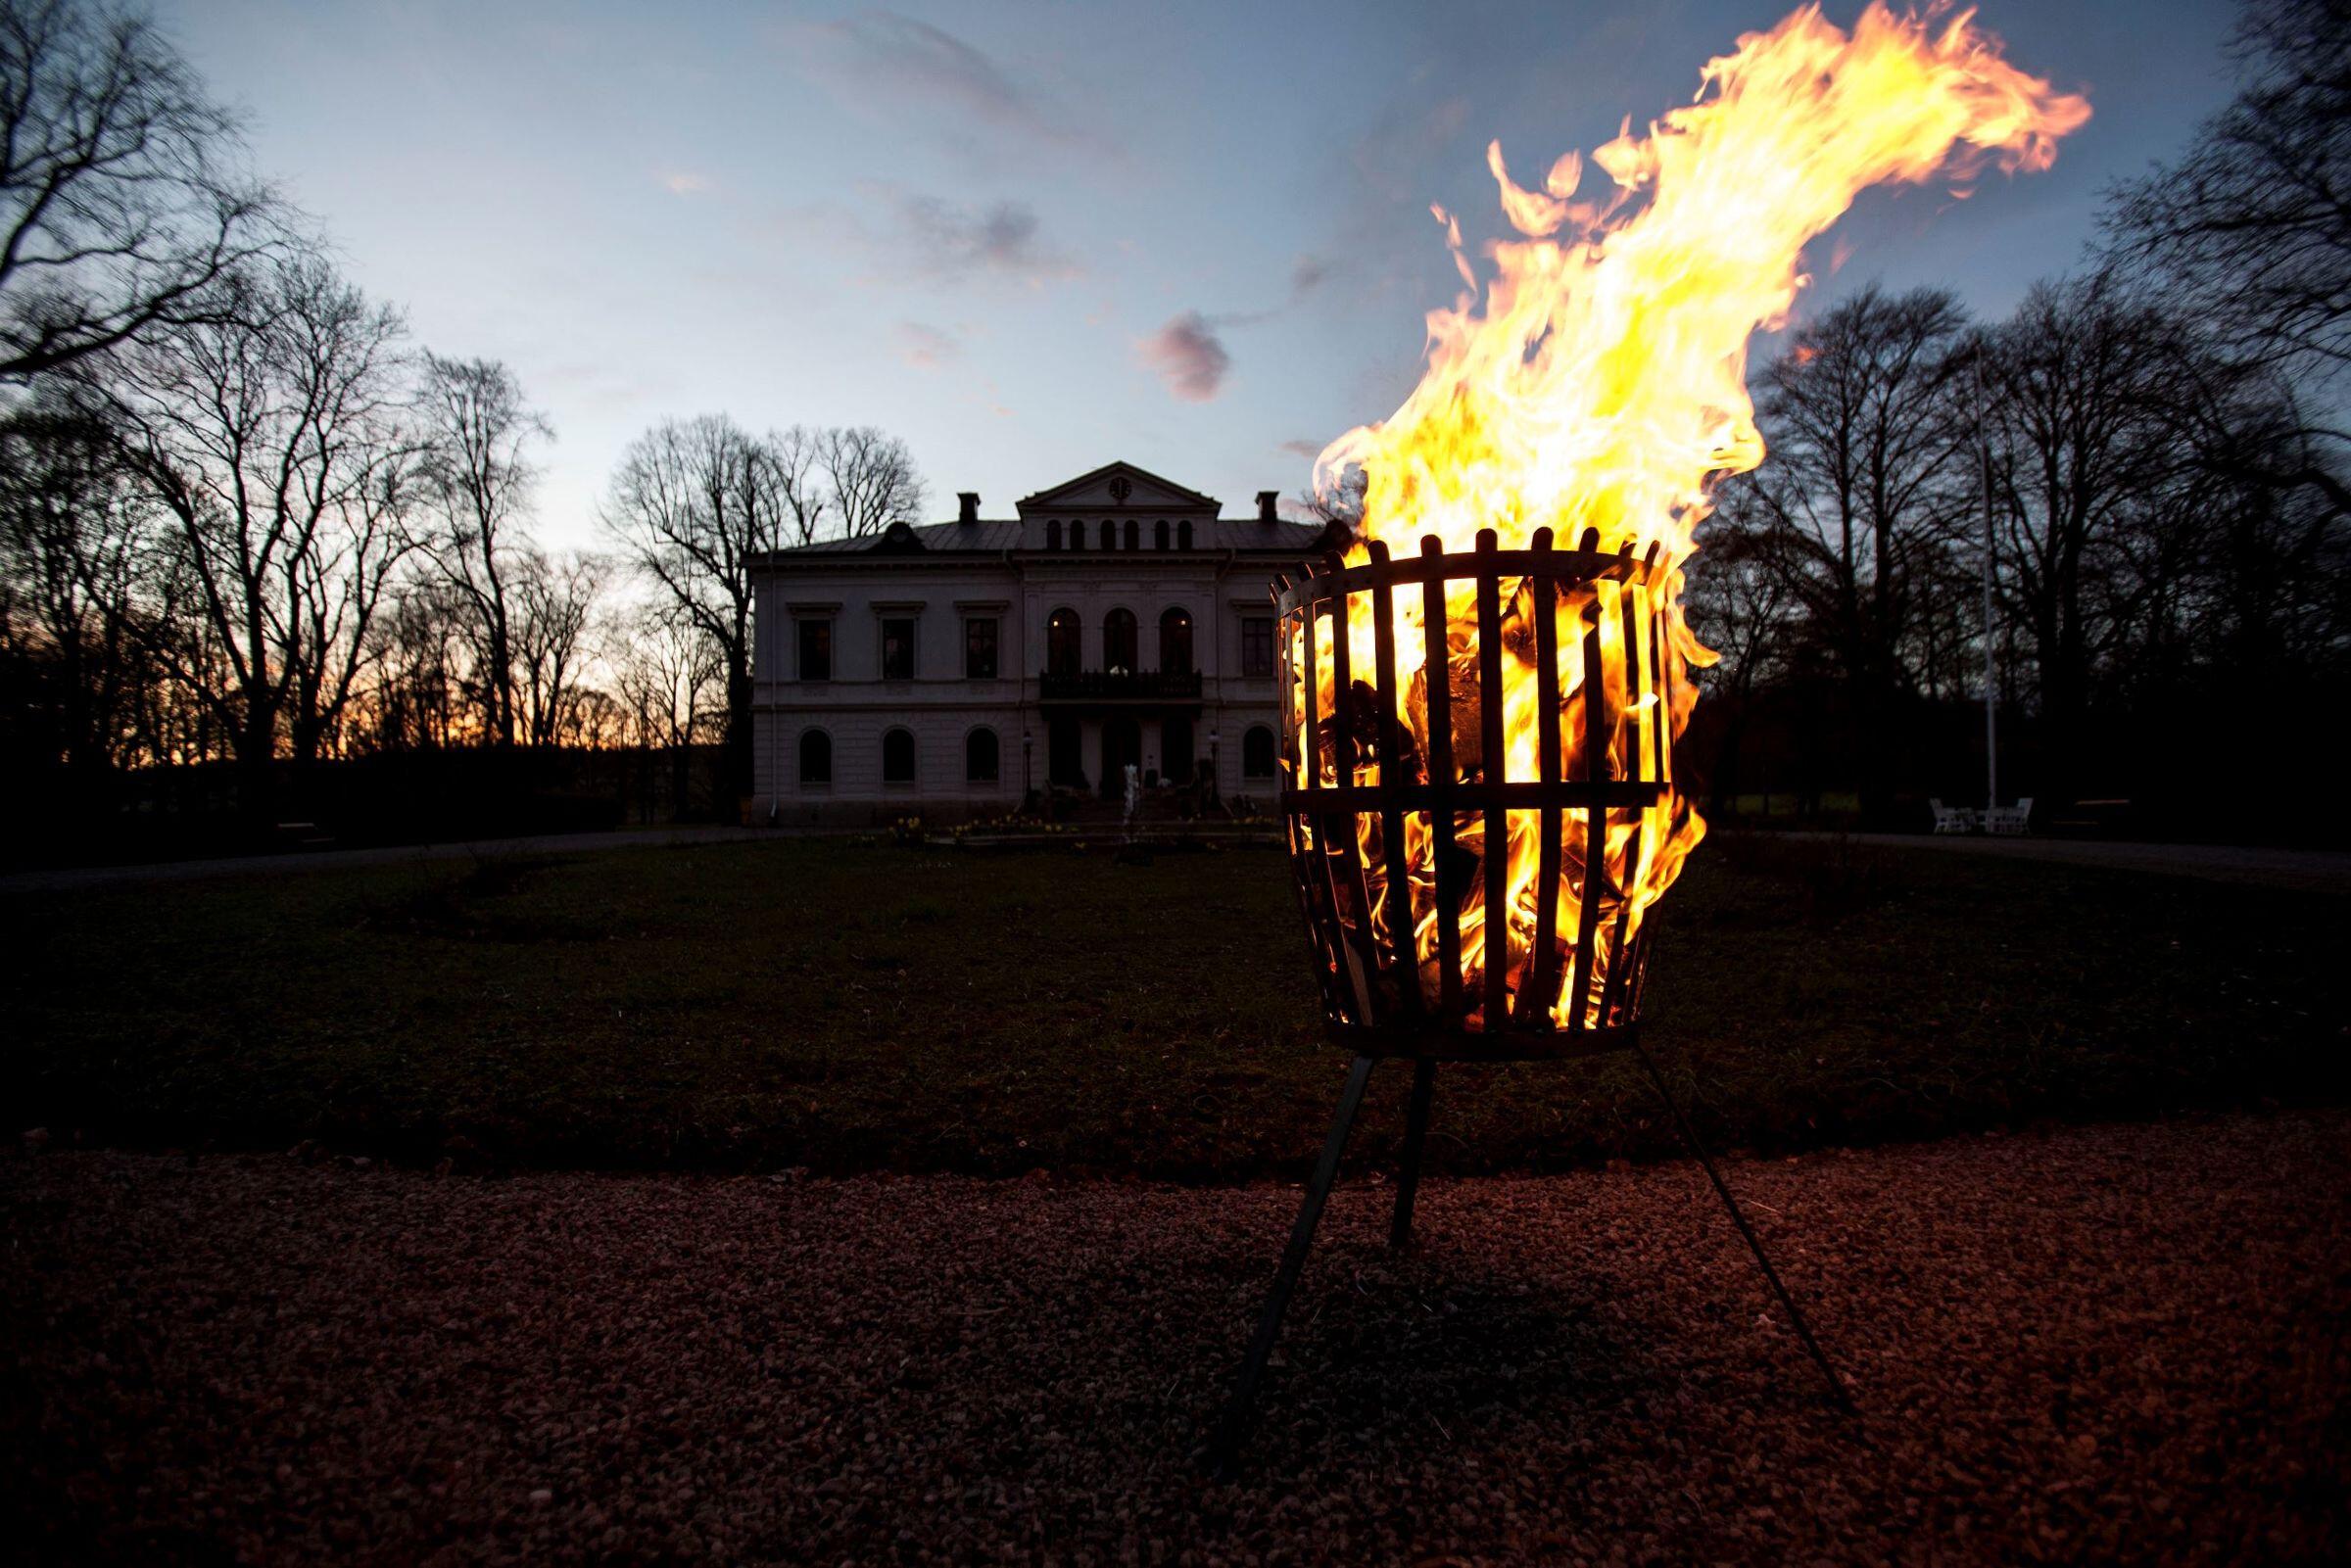 Fire basket baron